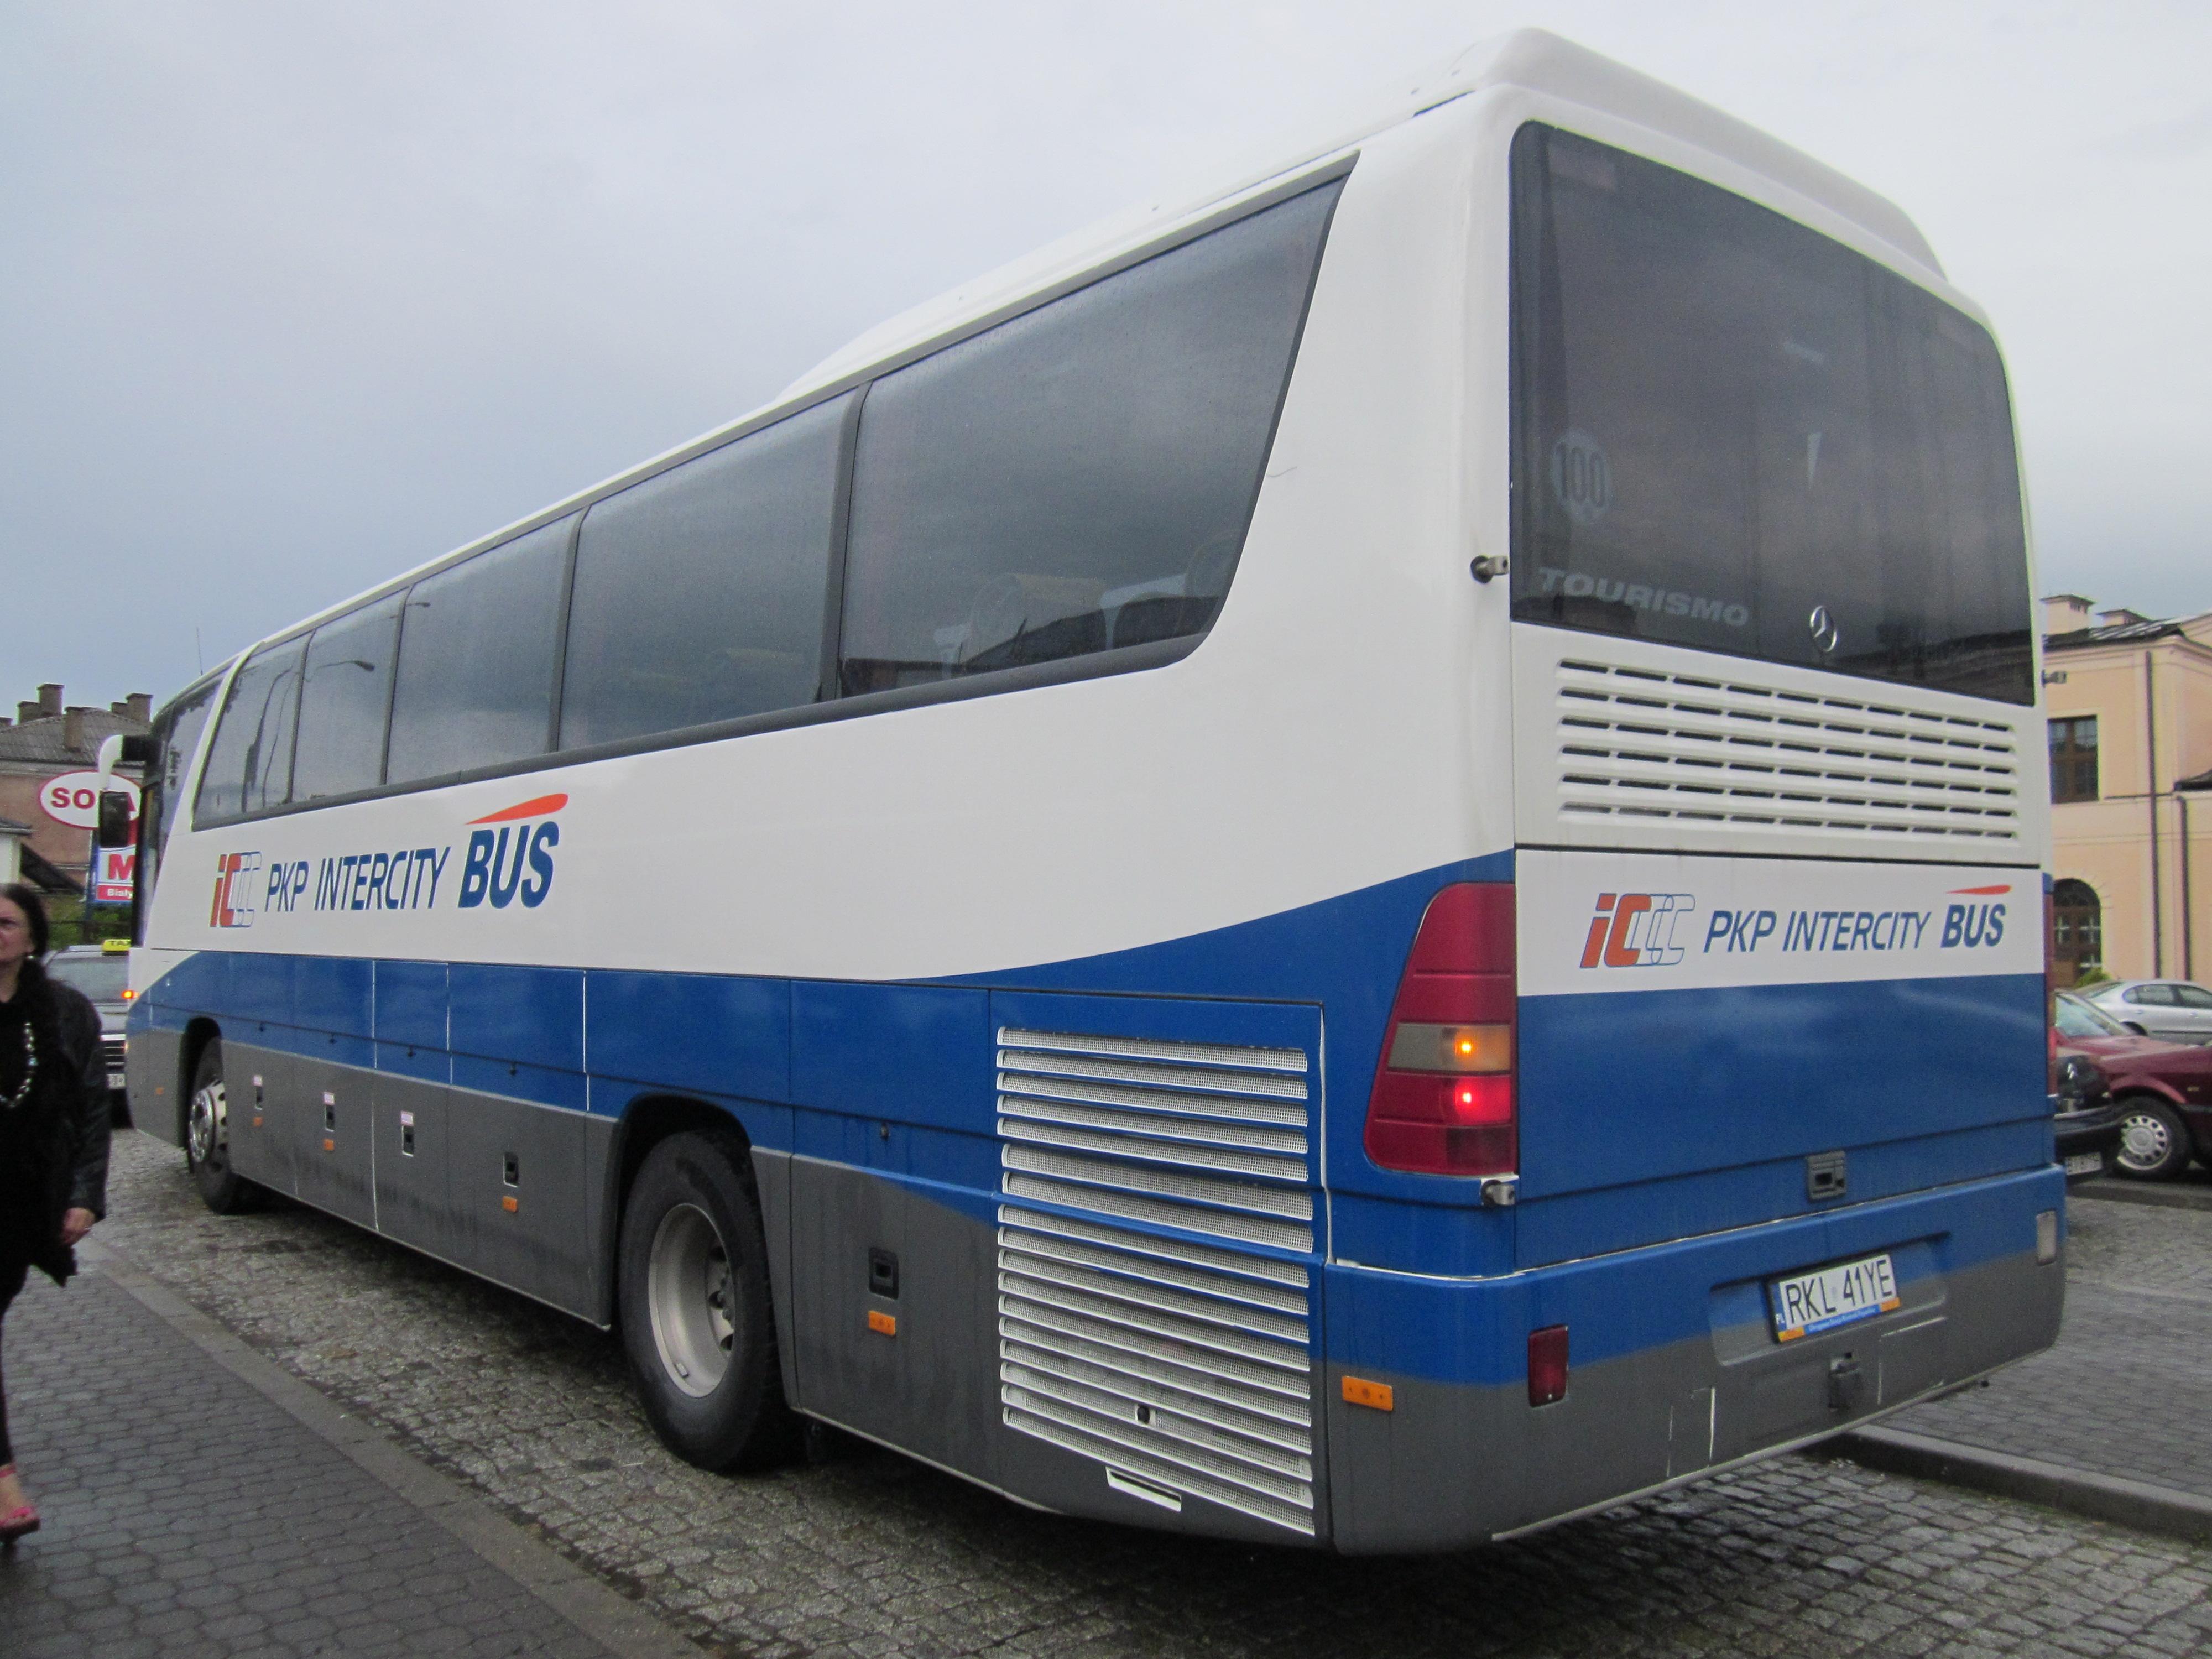 File:IC PKP Intercity Bus in Białystok jpg - Wikimedia Commons